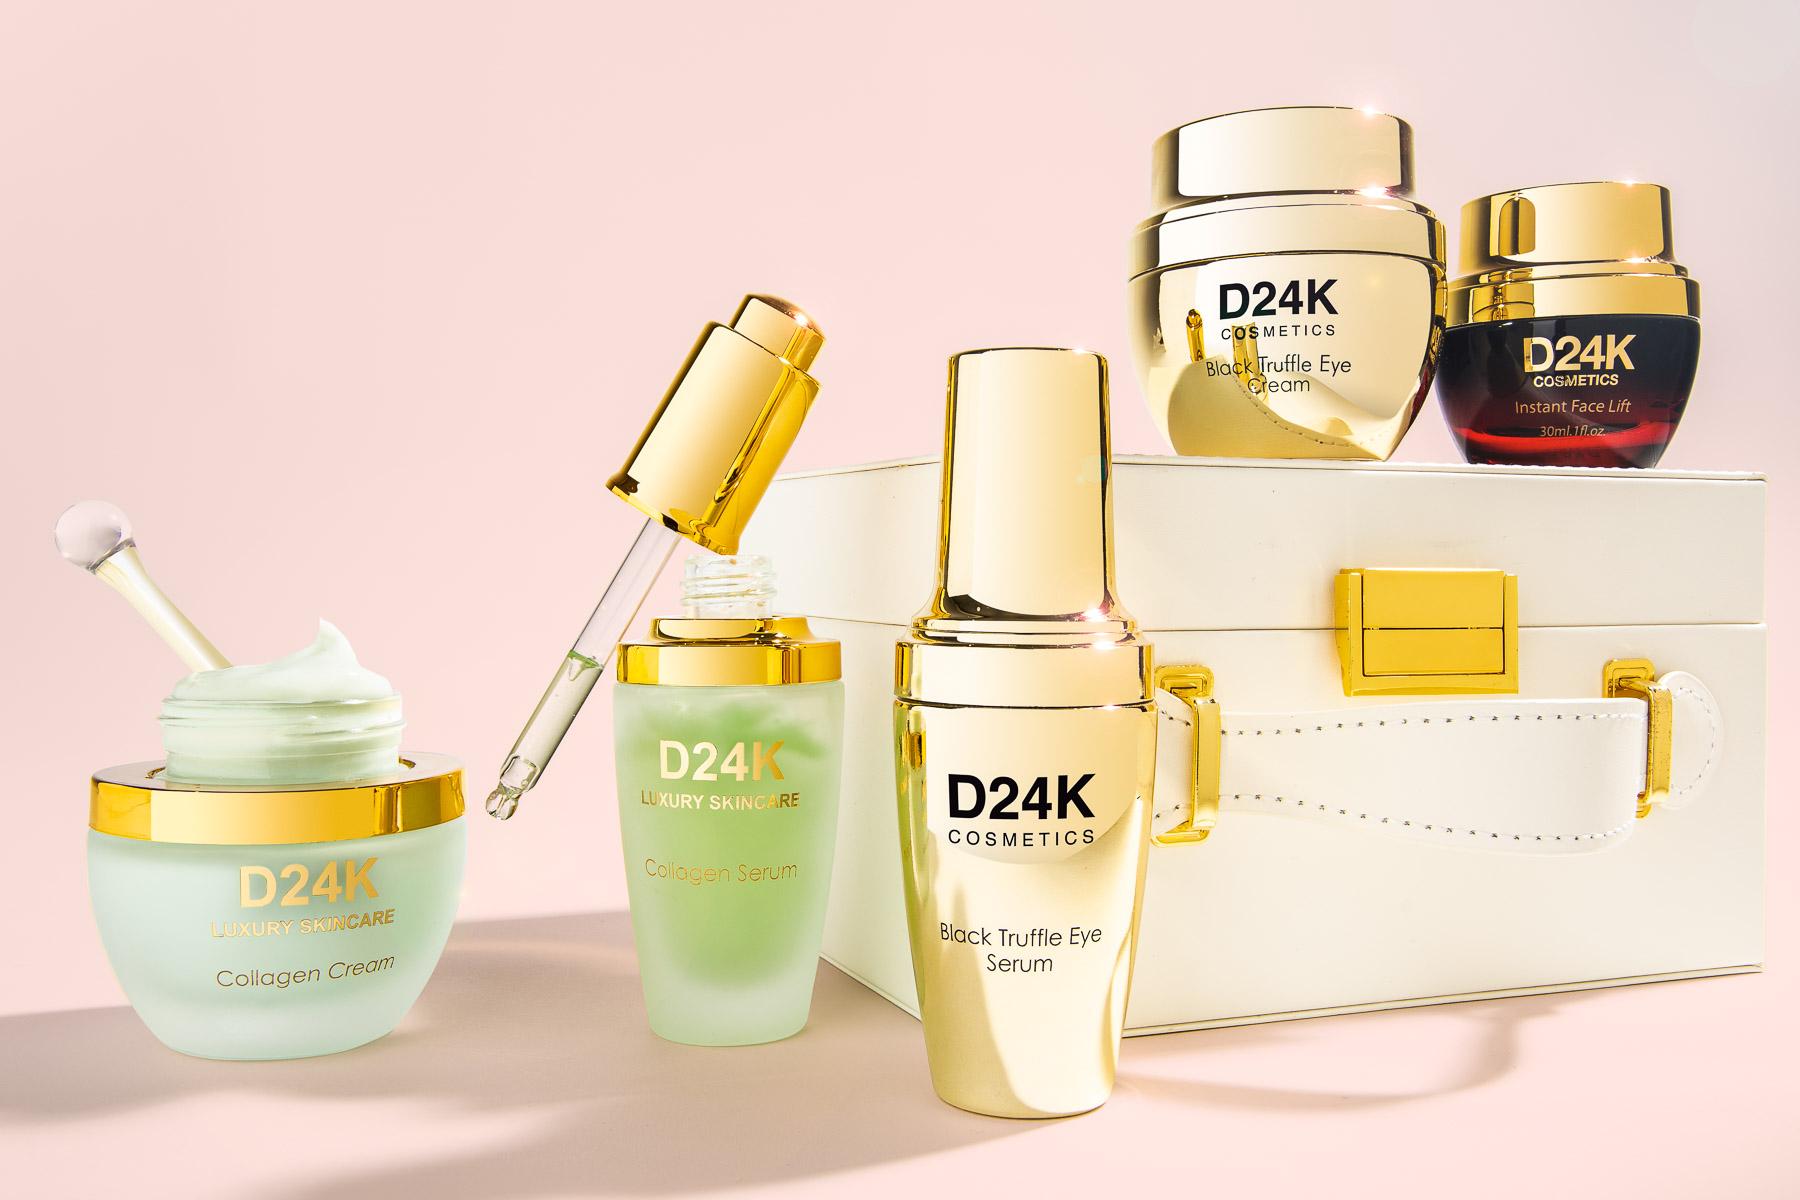 D24K_cosmetics_hero_hautelook_product-photography_raul_rodriguez_miami_new york.jpg